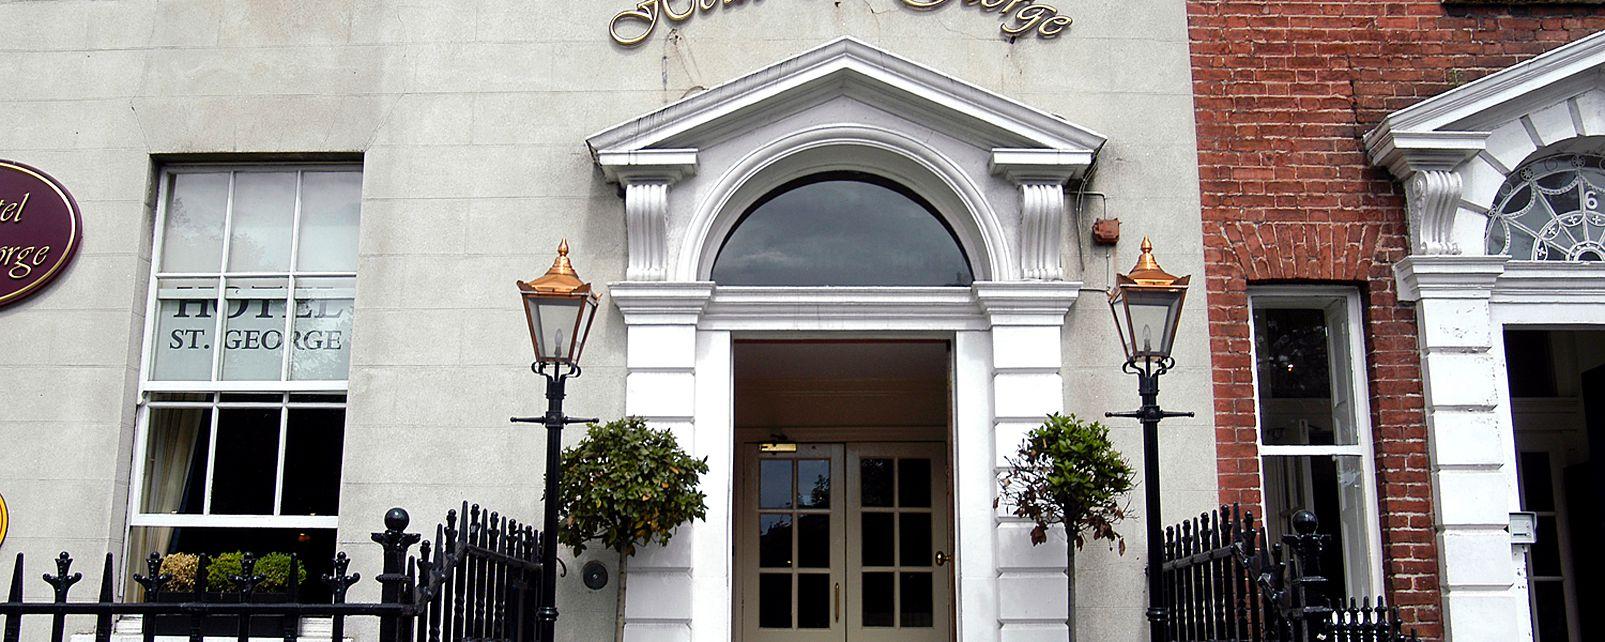 Hotel St George Dublin Website